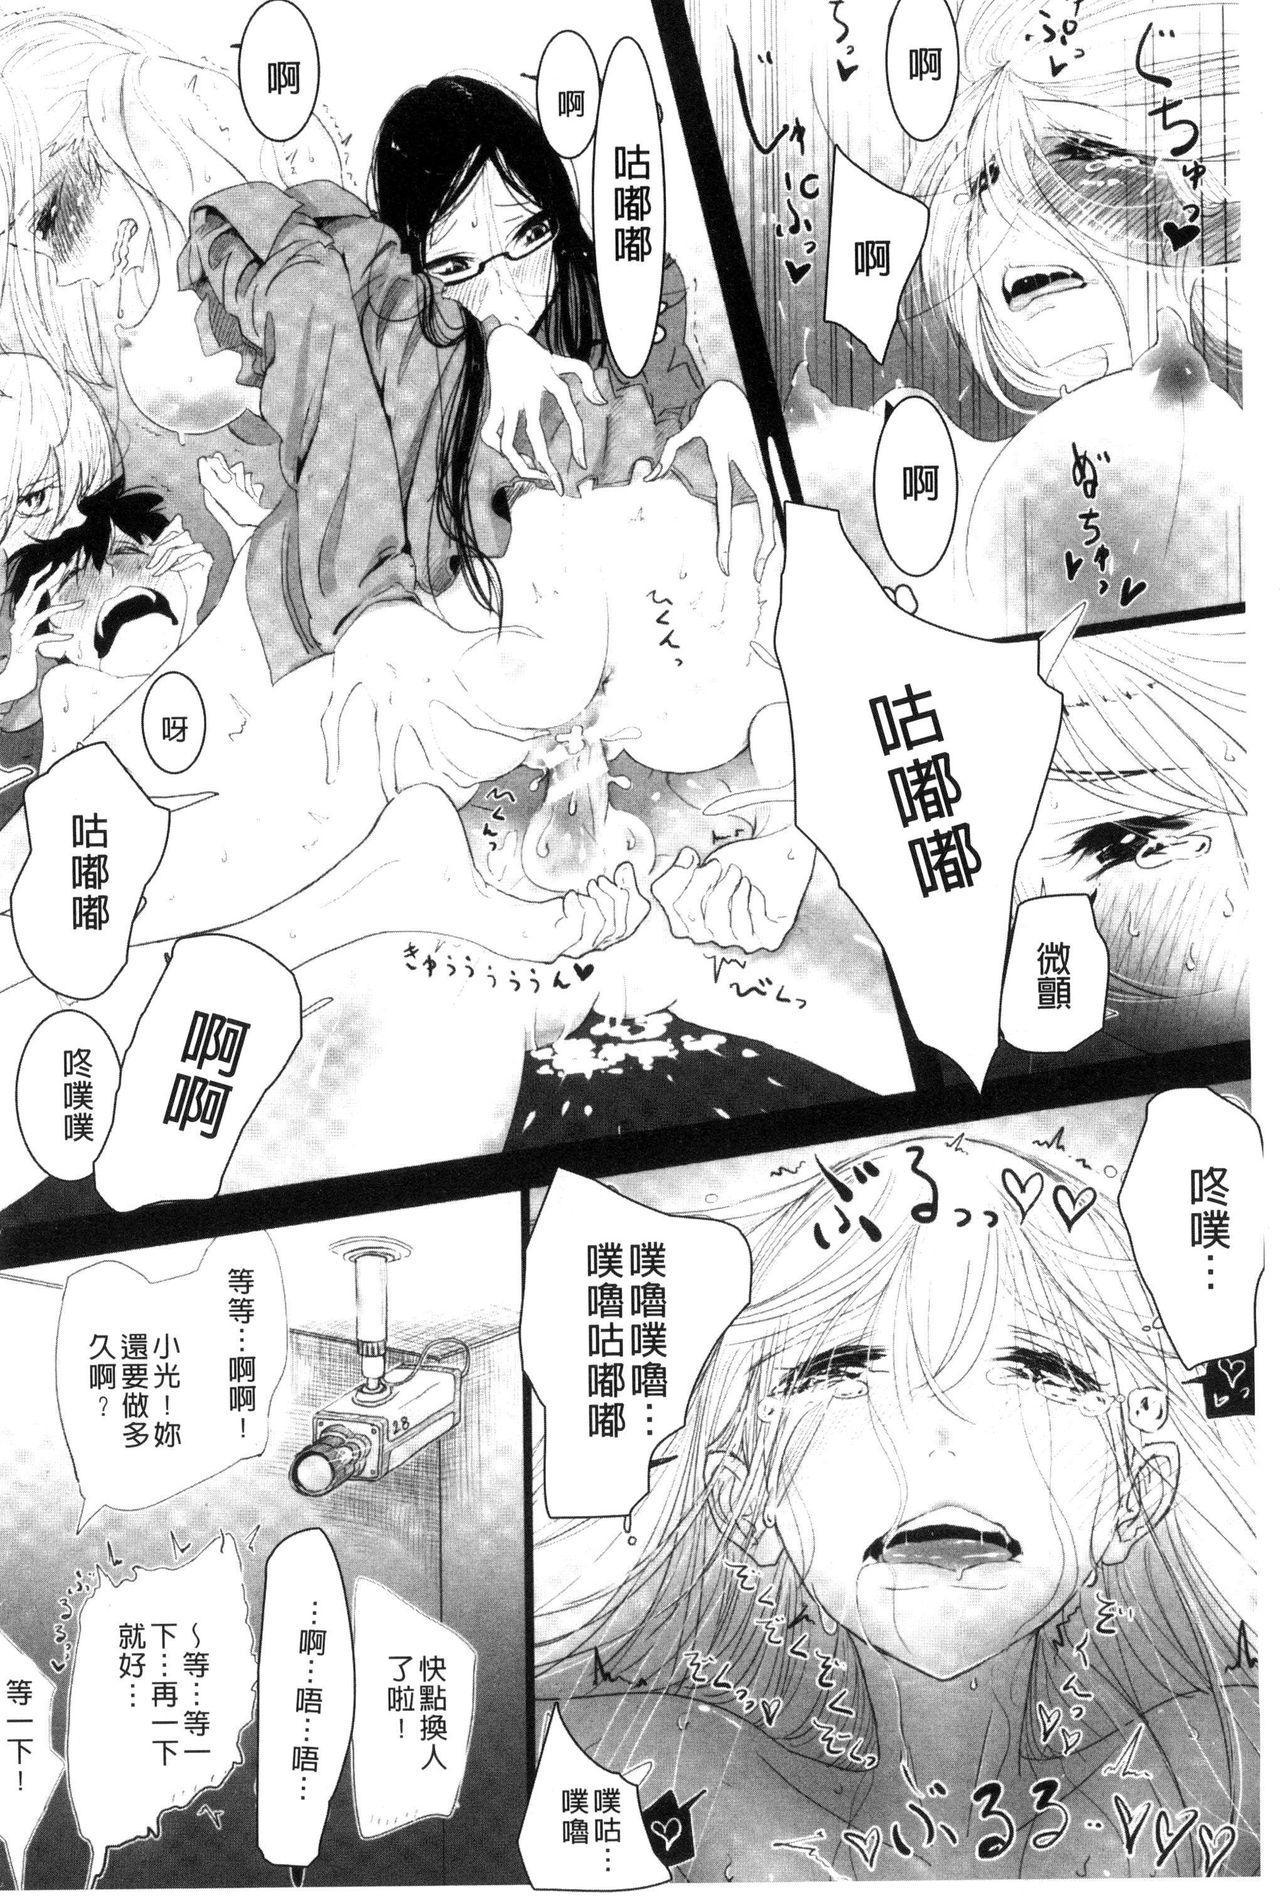 [Dhibi] Sono Yubisaki de Korogashite - Please Caress it at the Finger-tip. [Chinese] 167